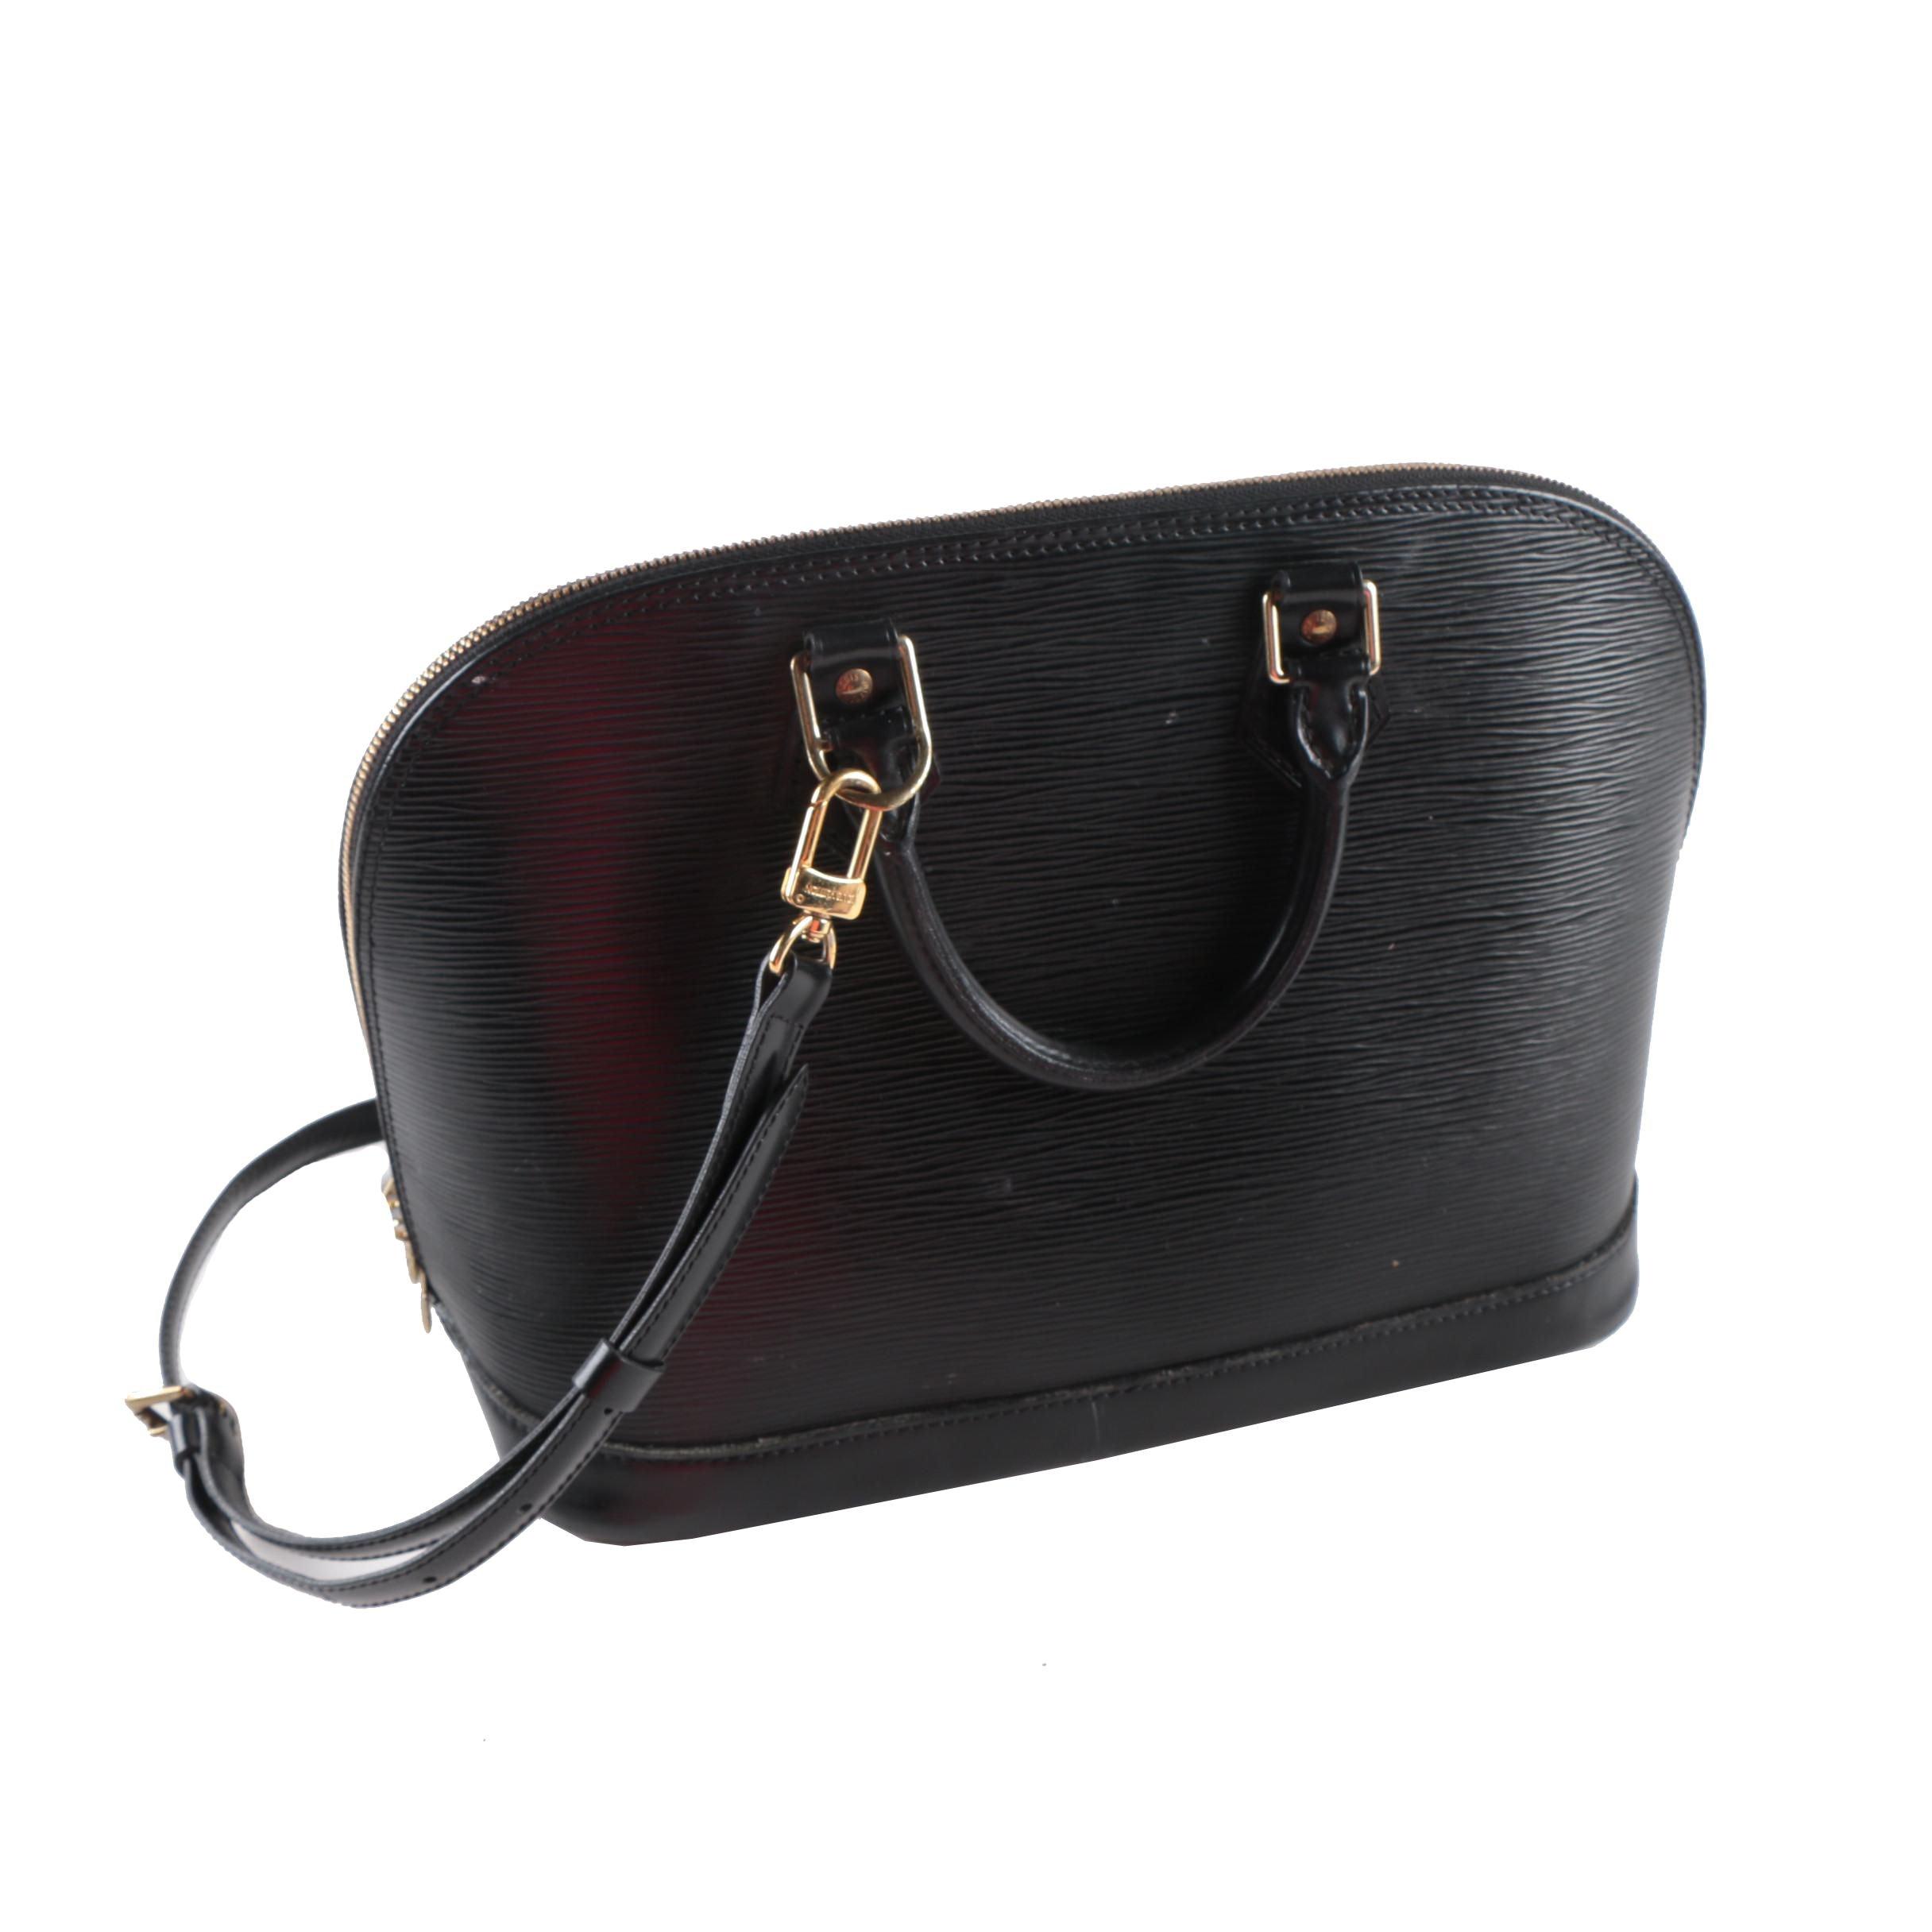 Vintage Louis Vuitton Alma Black Epi Leather Satchel